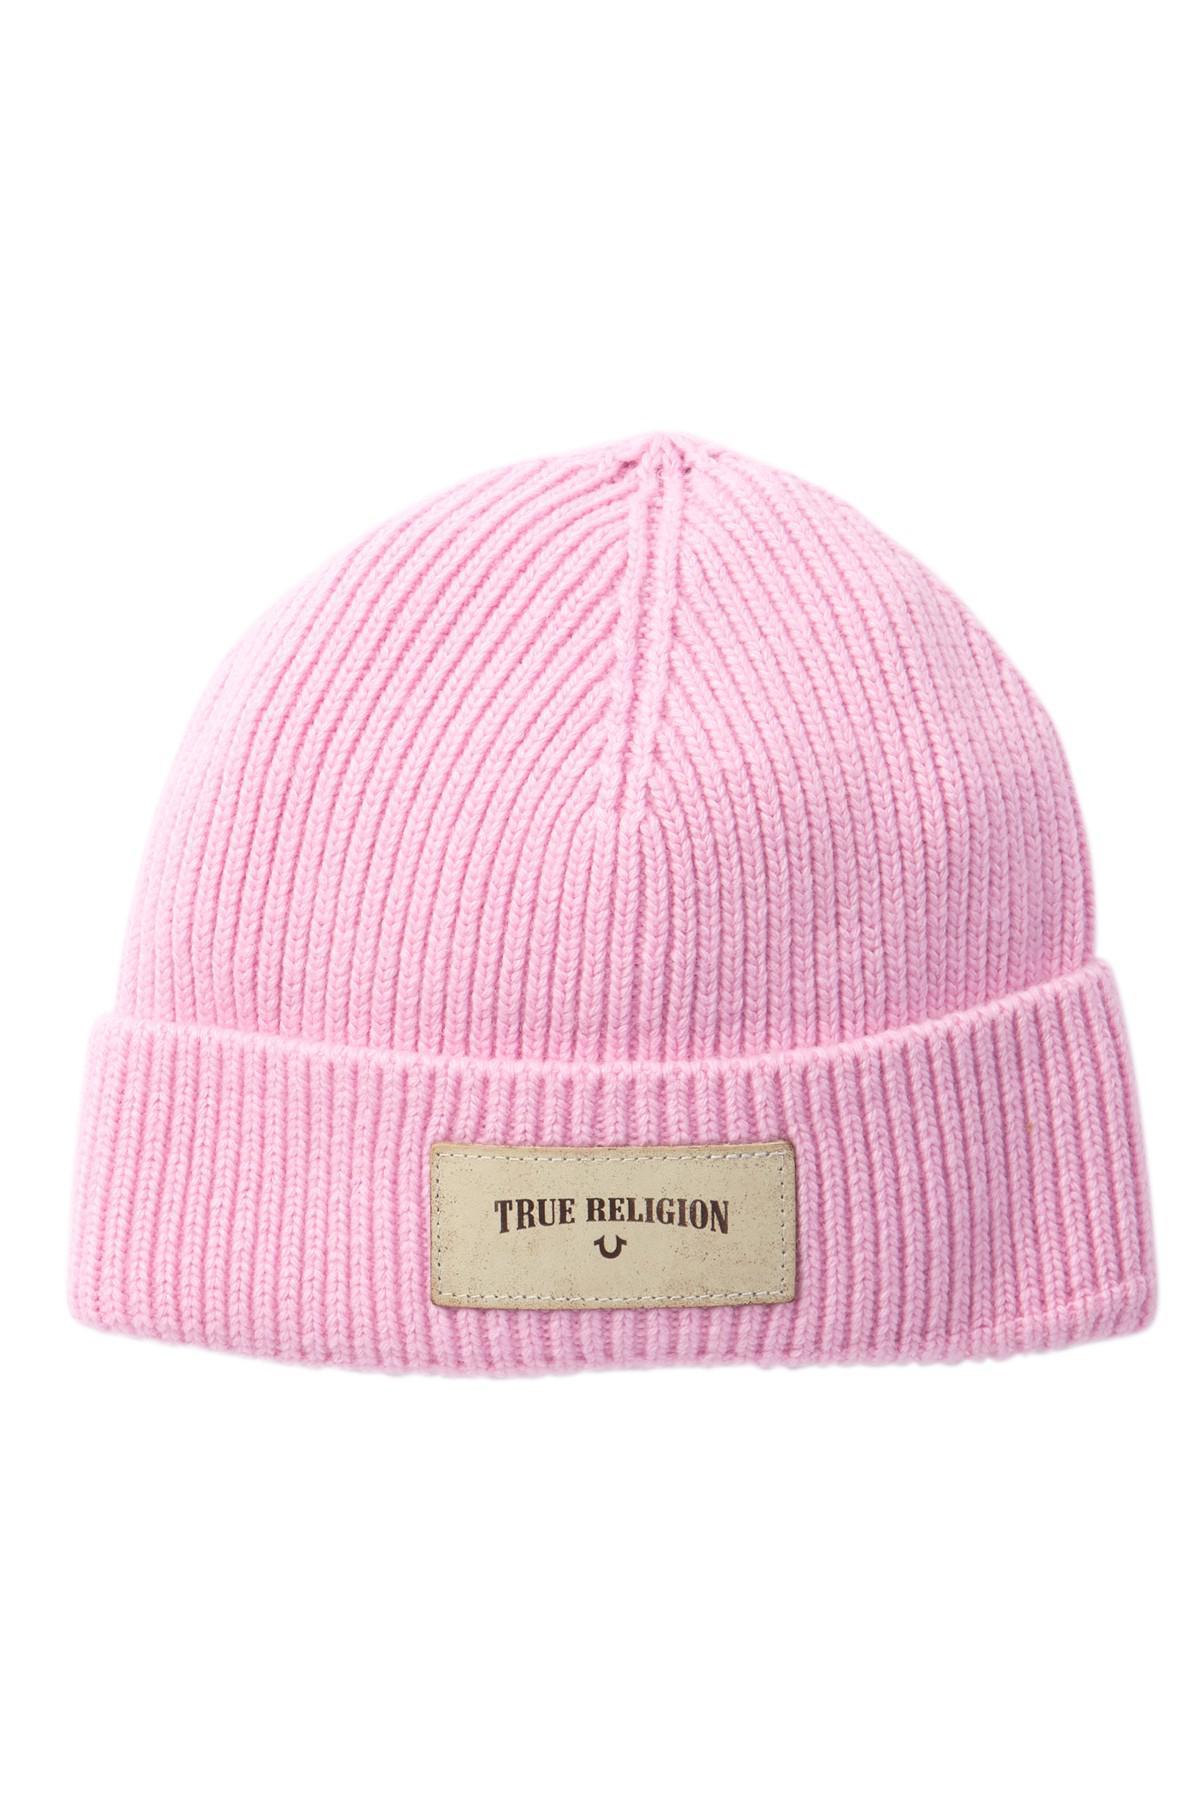 8e85310180b39 Lyst - True Religion Rib Knit Beanie in Pink for Men